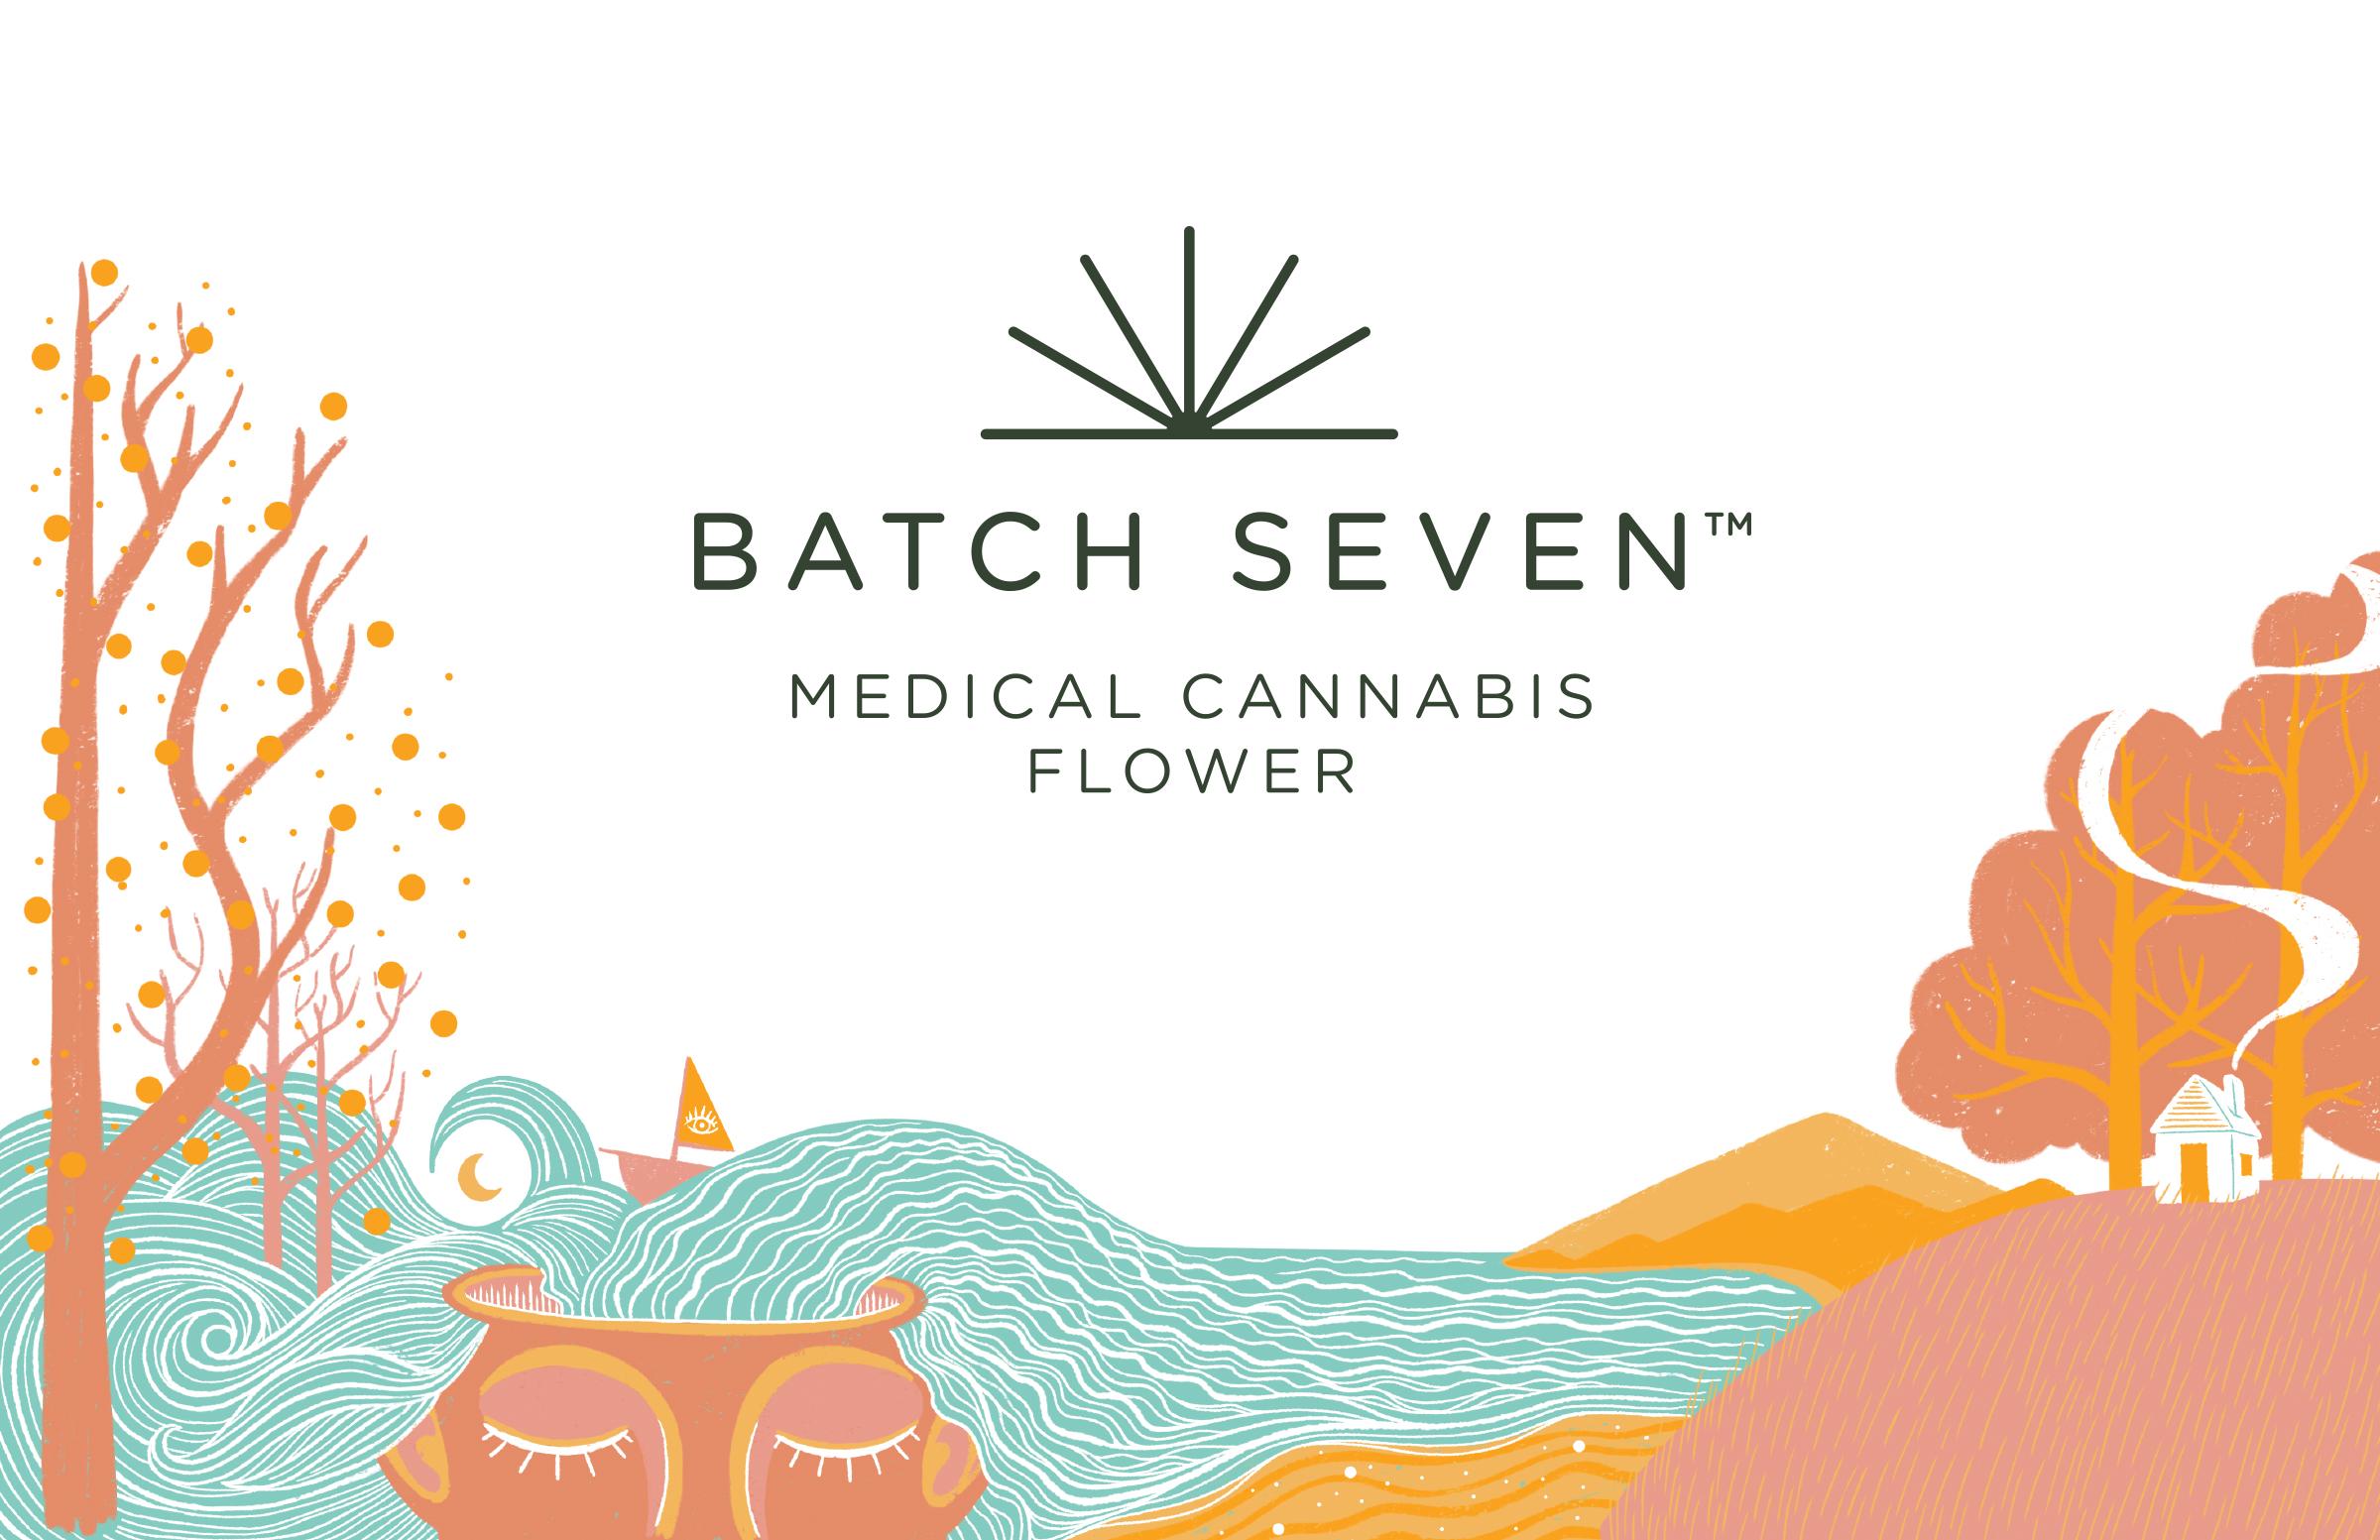 BatchSeven_Flower.jpg